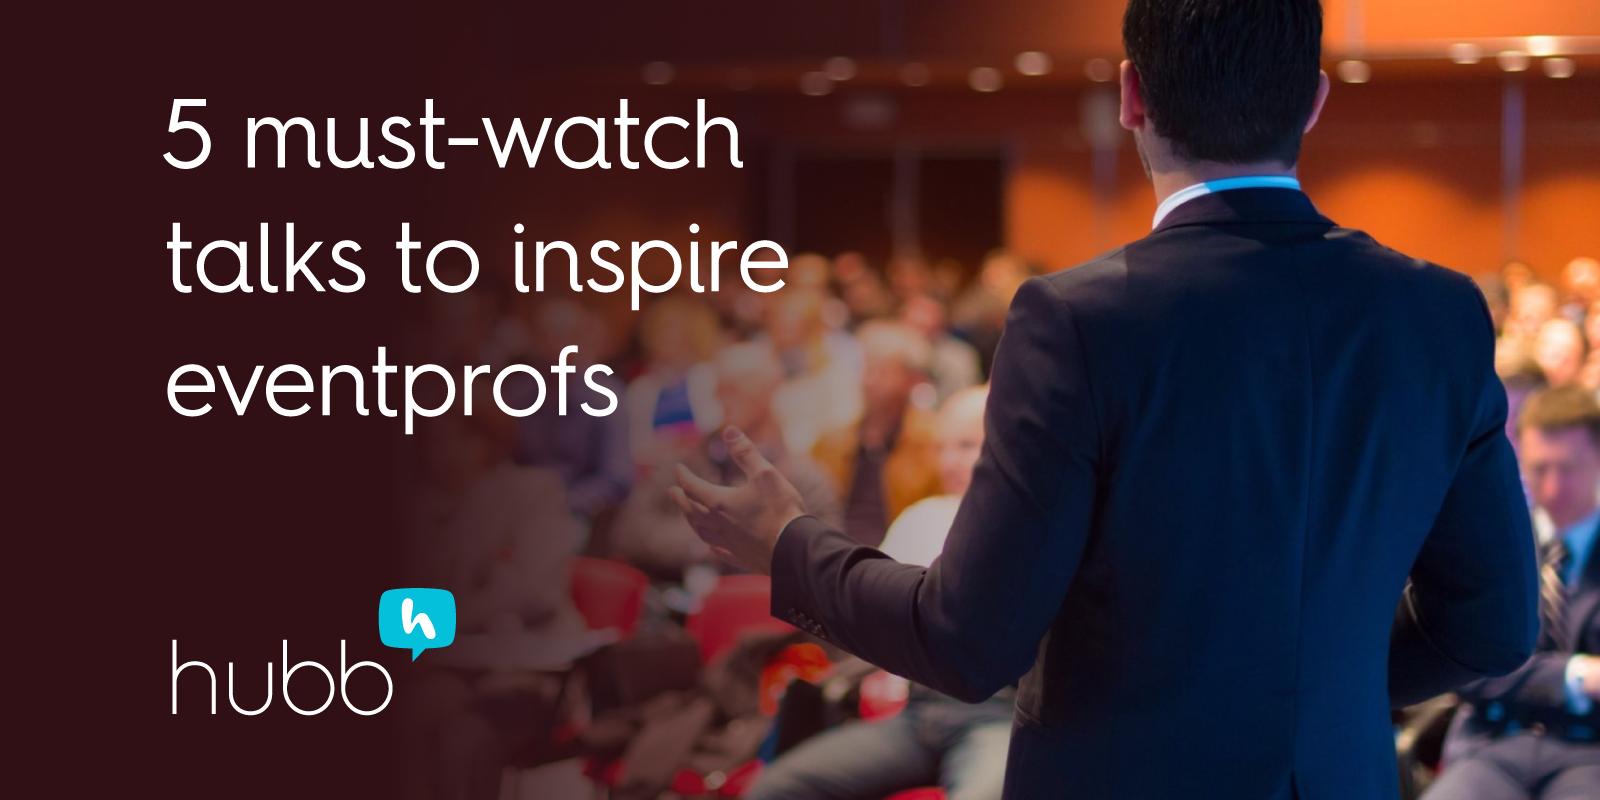 5 must-watch talks to inspire eventprofs